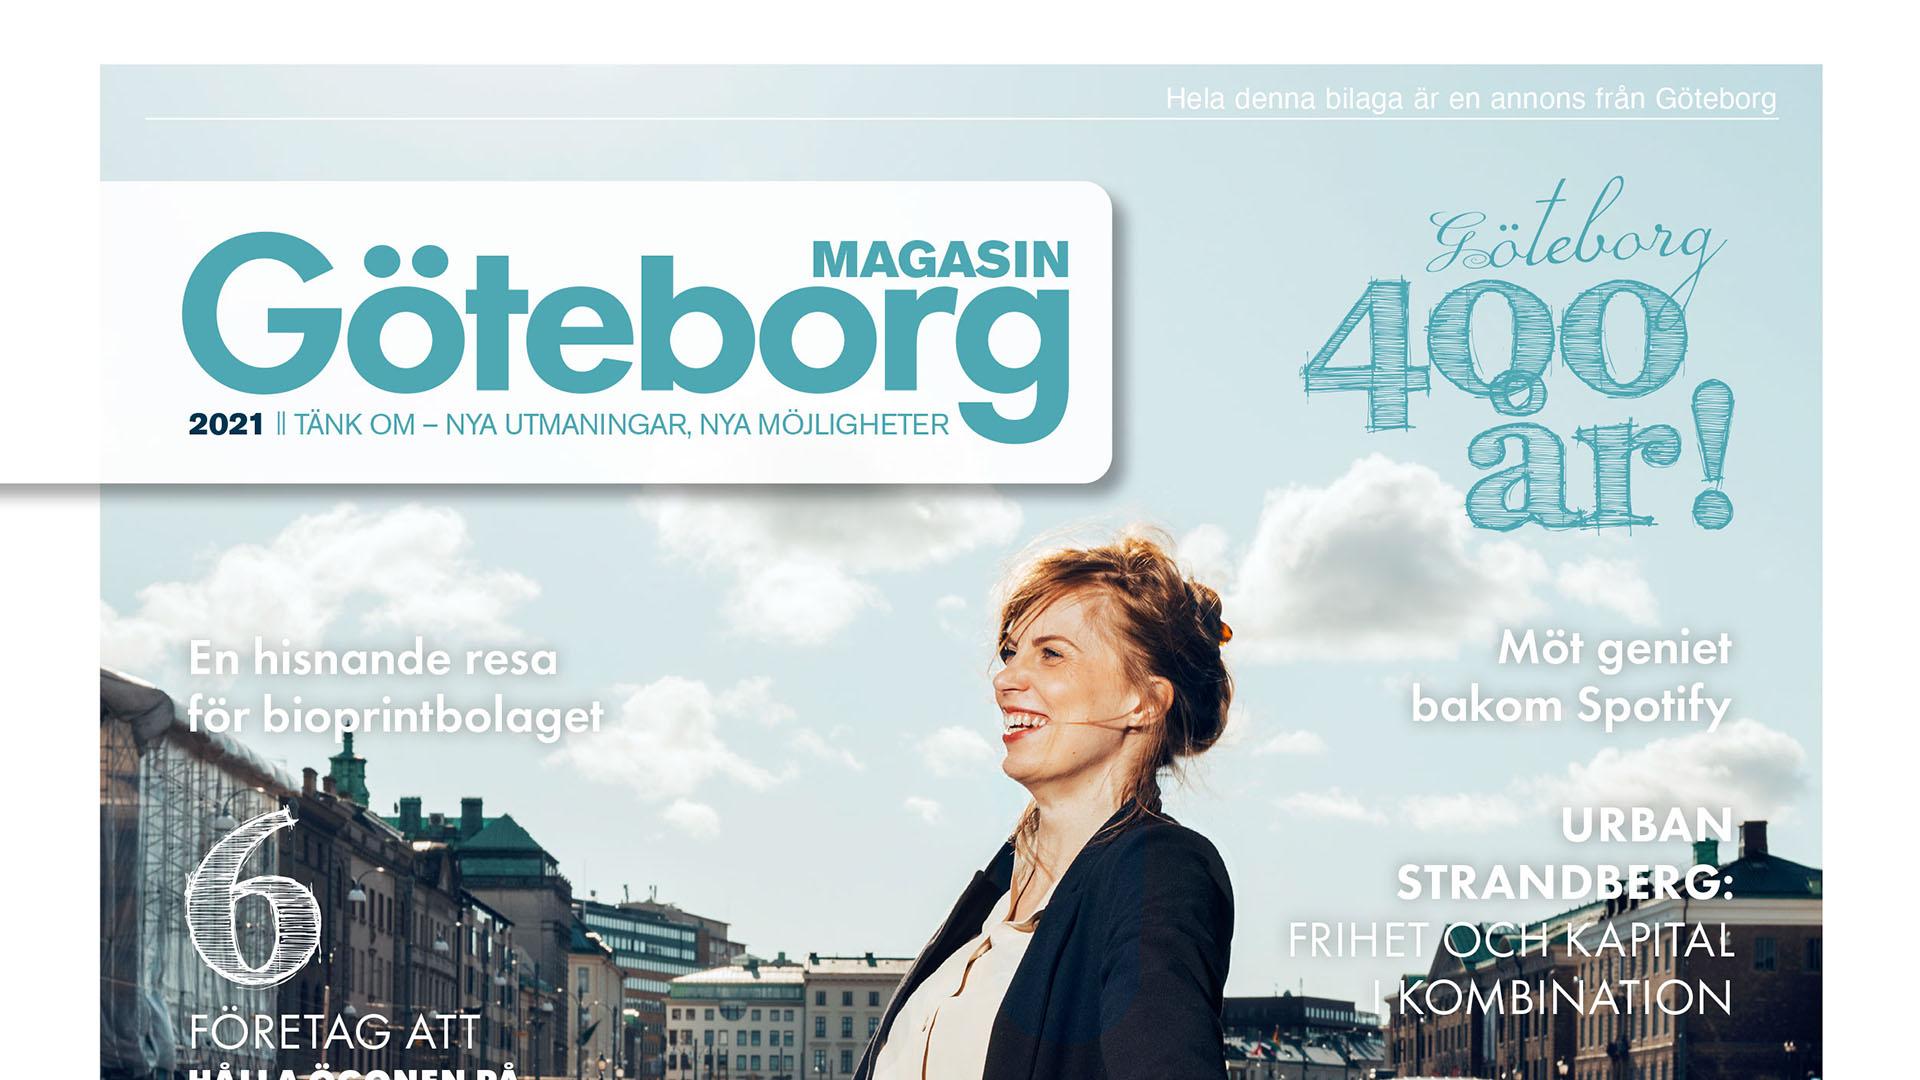 Magasin Göteborg - framsidan